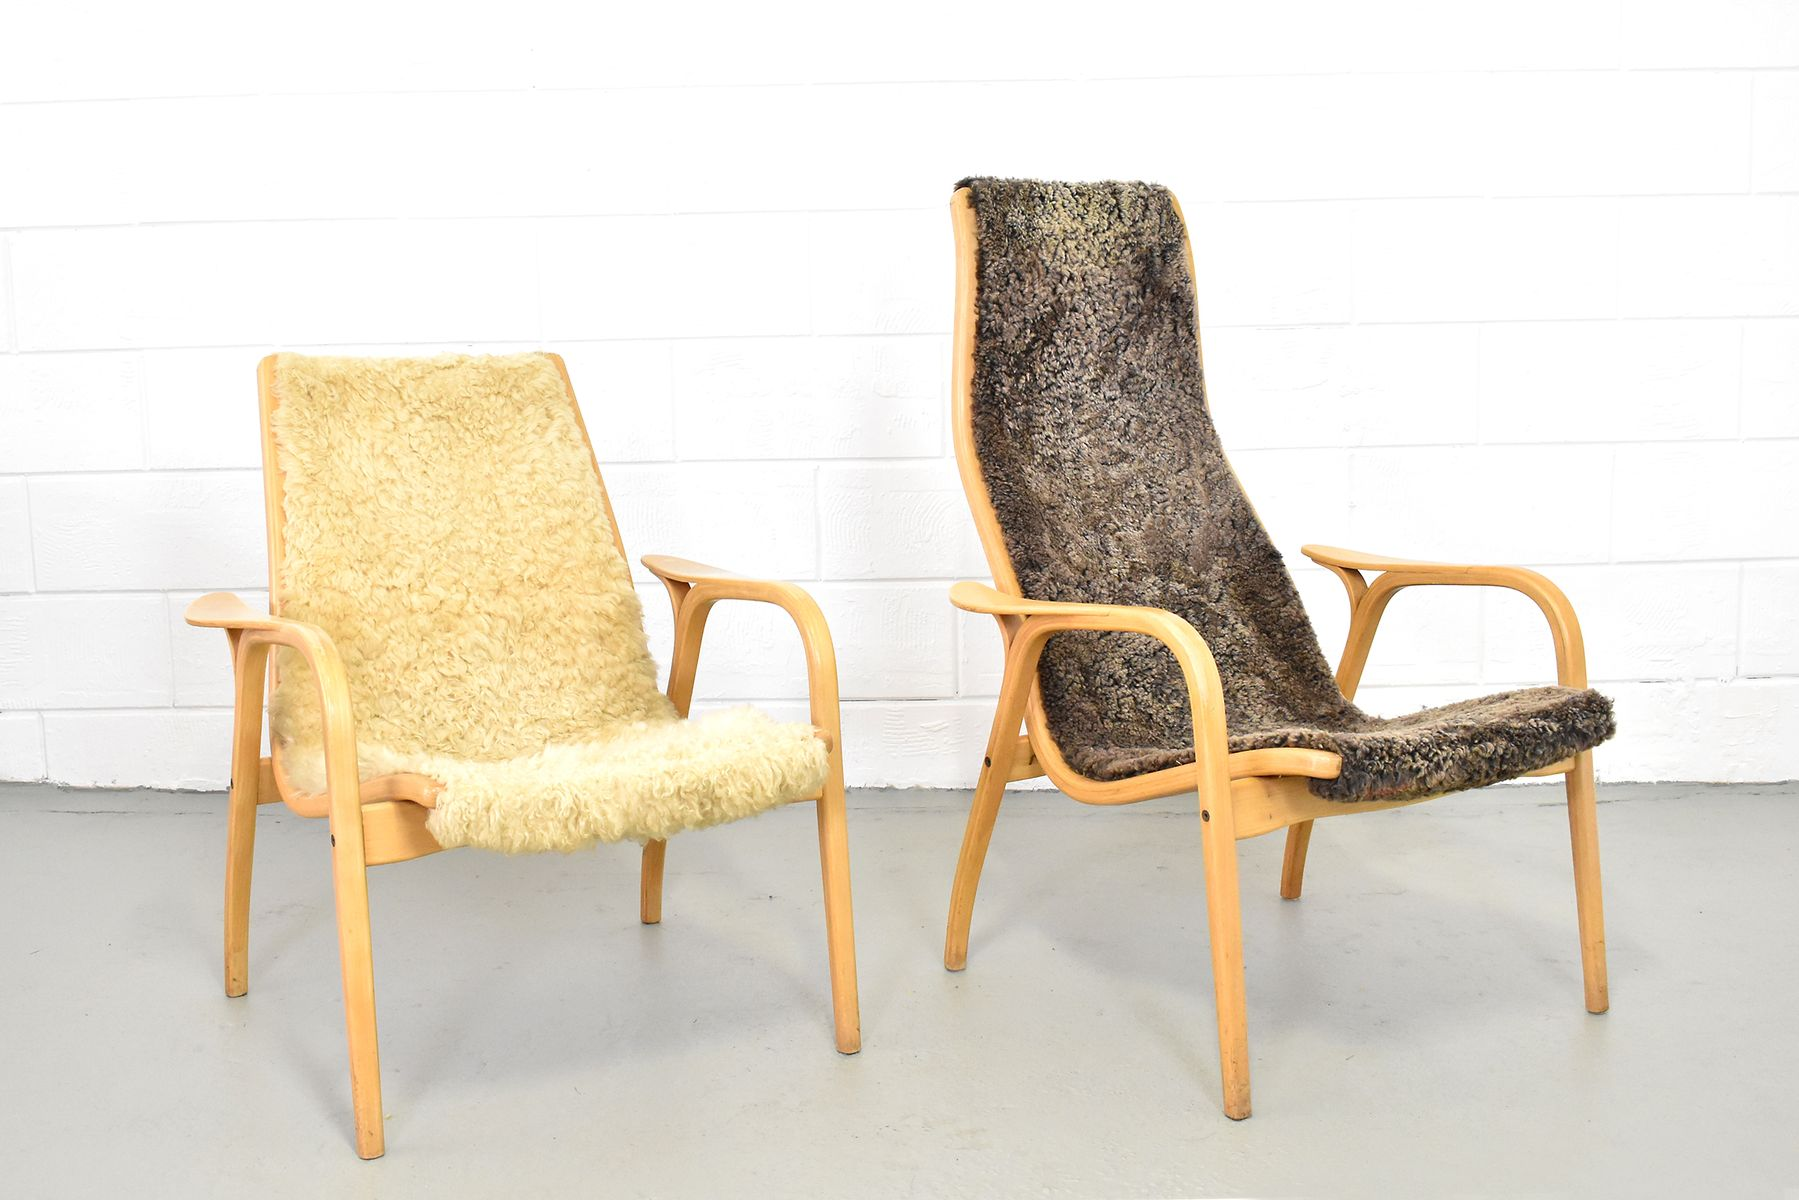 Vintage Lamino Sheepskin Chairs By Yngve Ekström For Swedese, Set Of 2